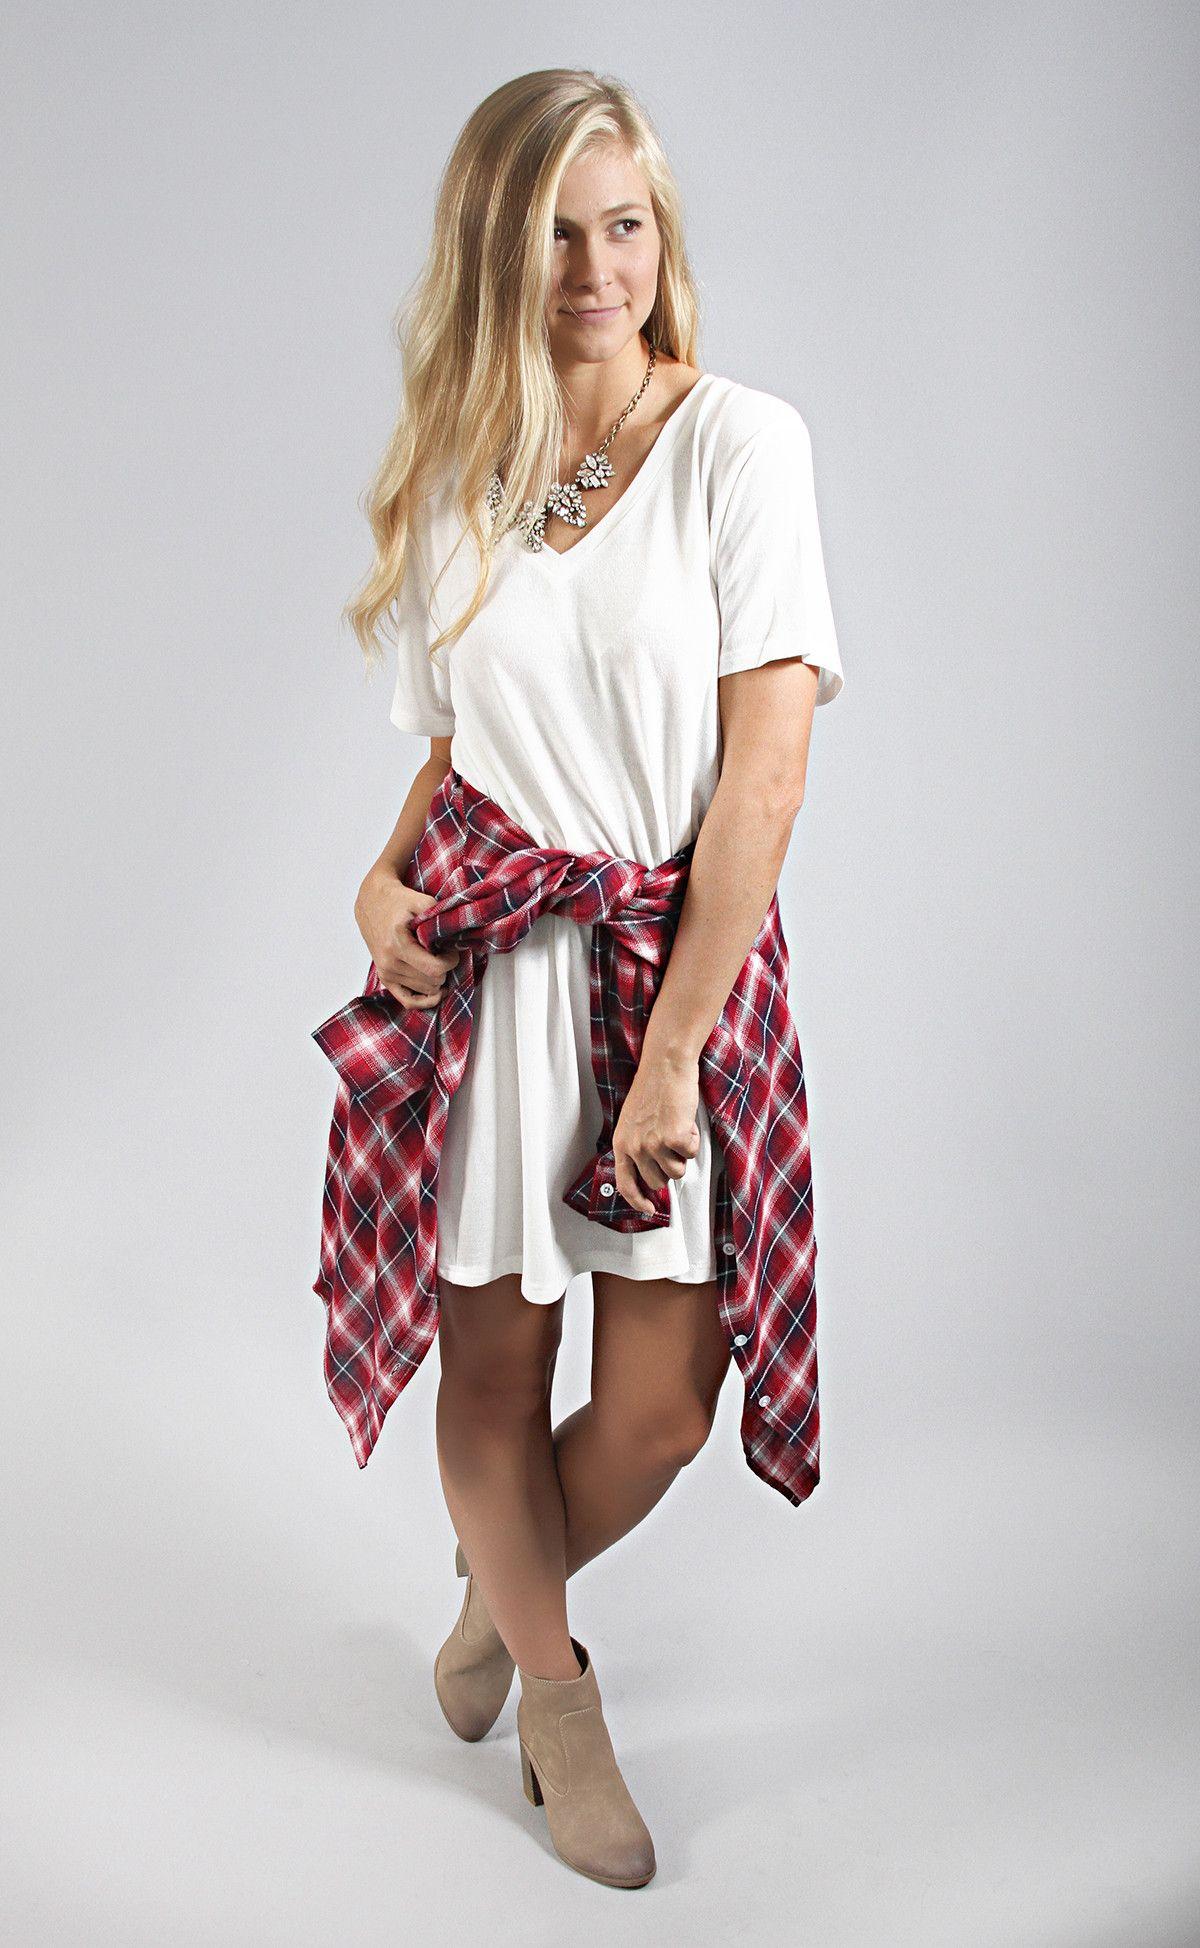 cream of the crop swing dress from ShopRiffraff.com